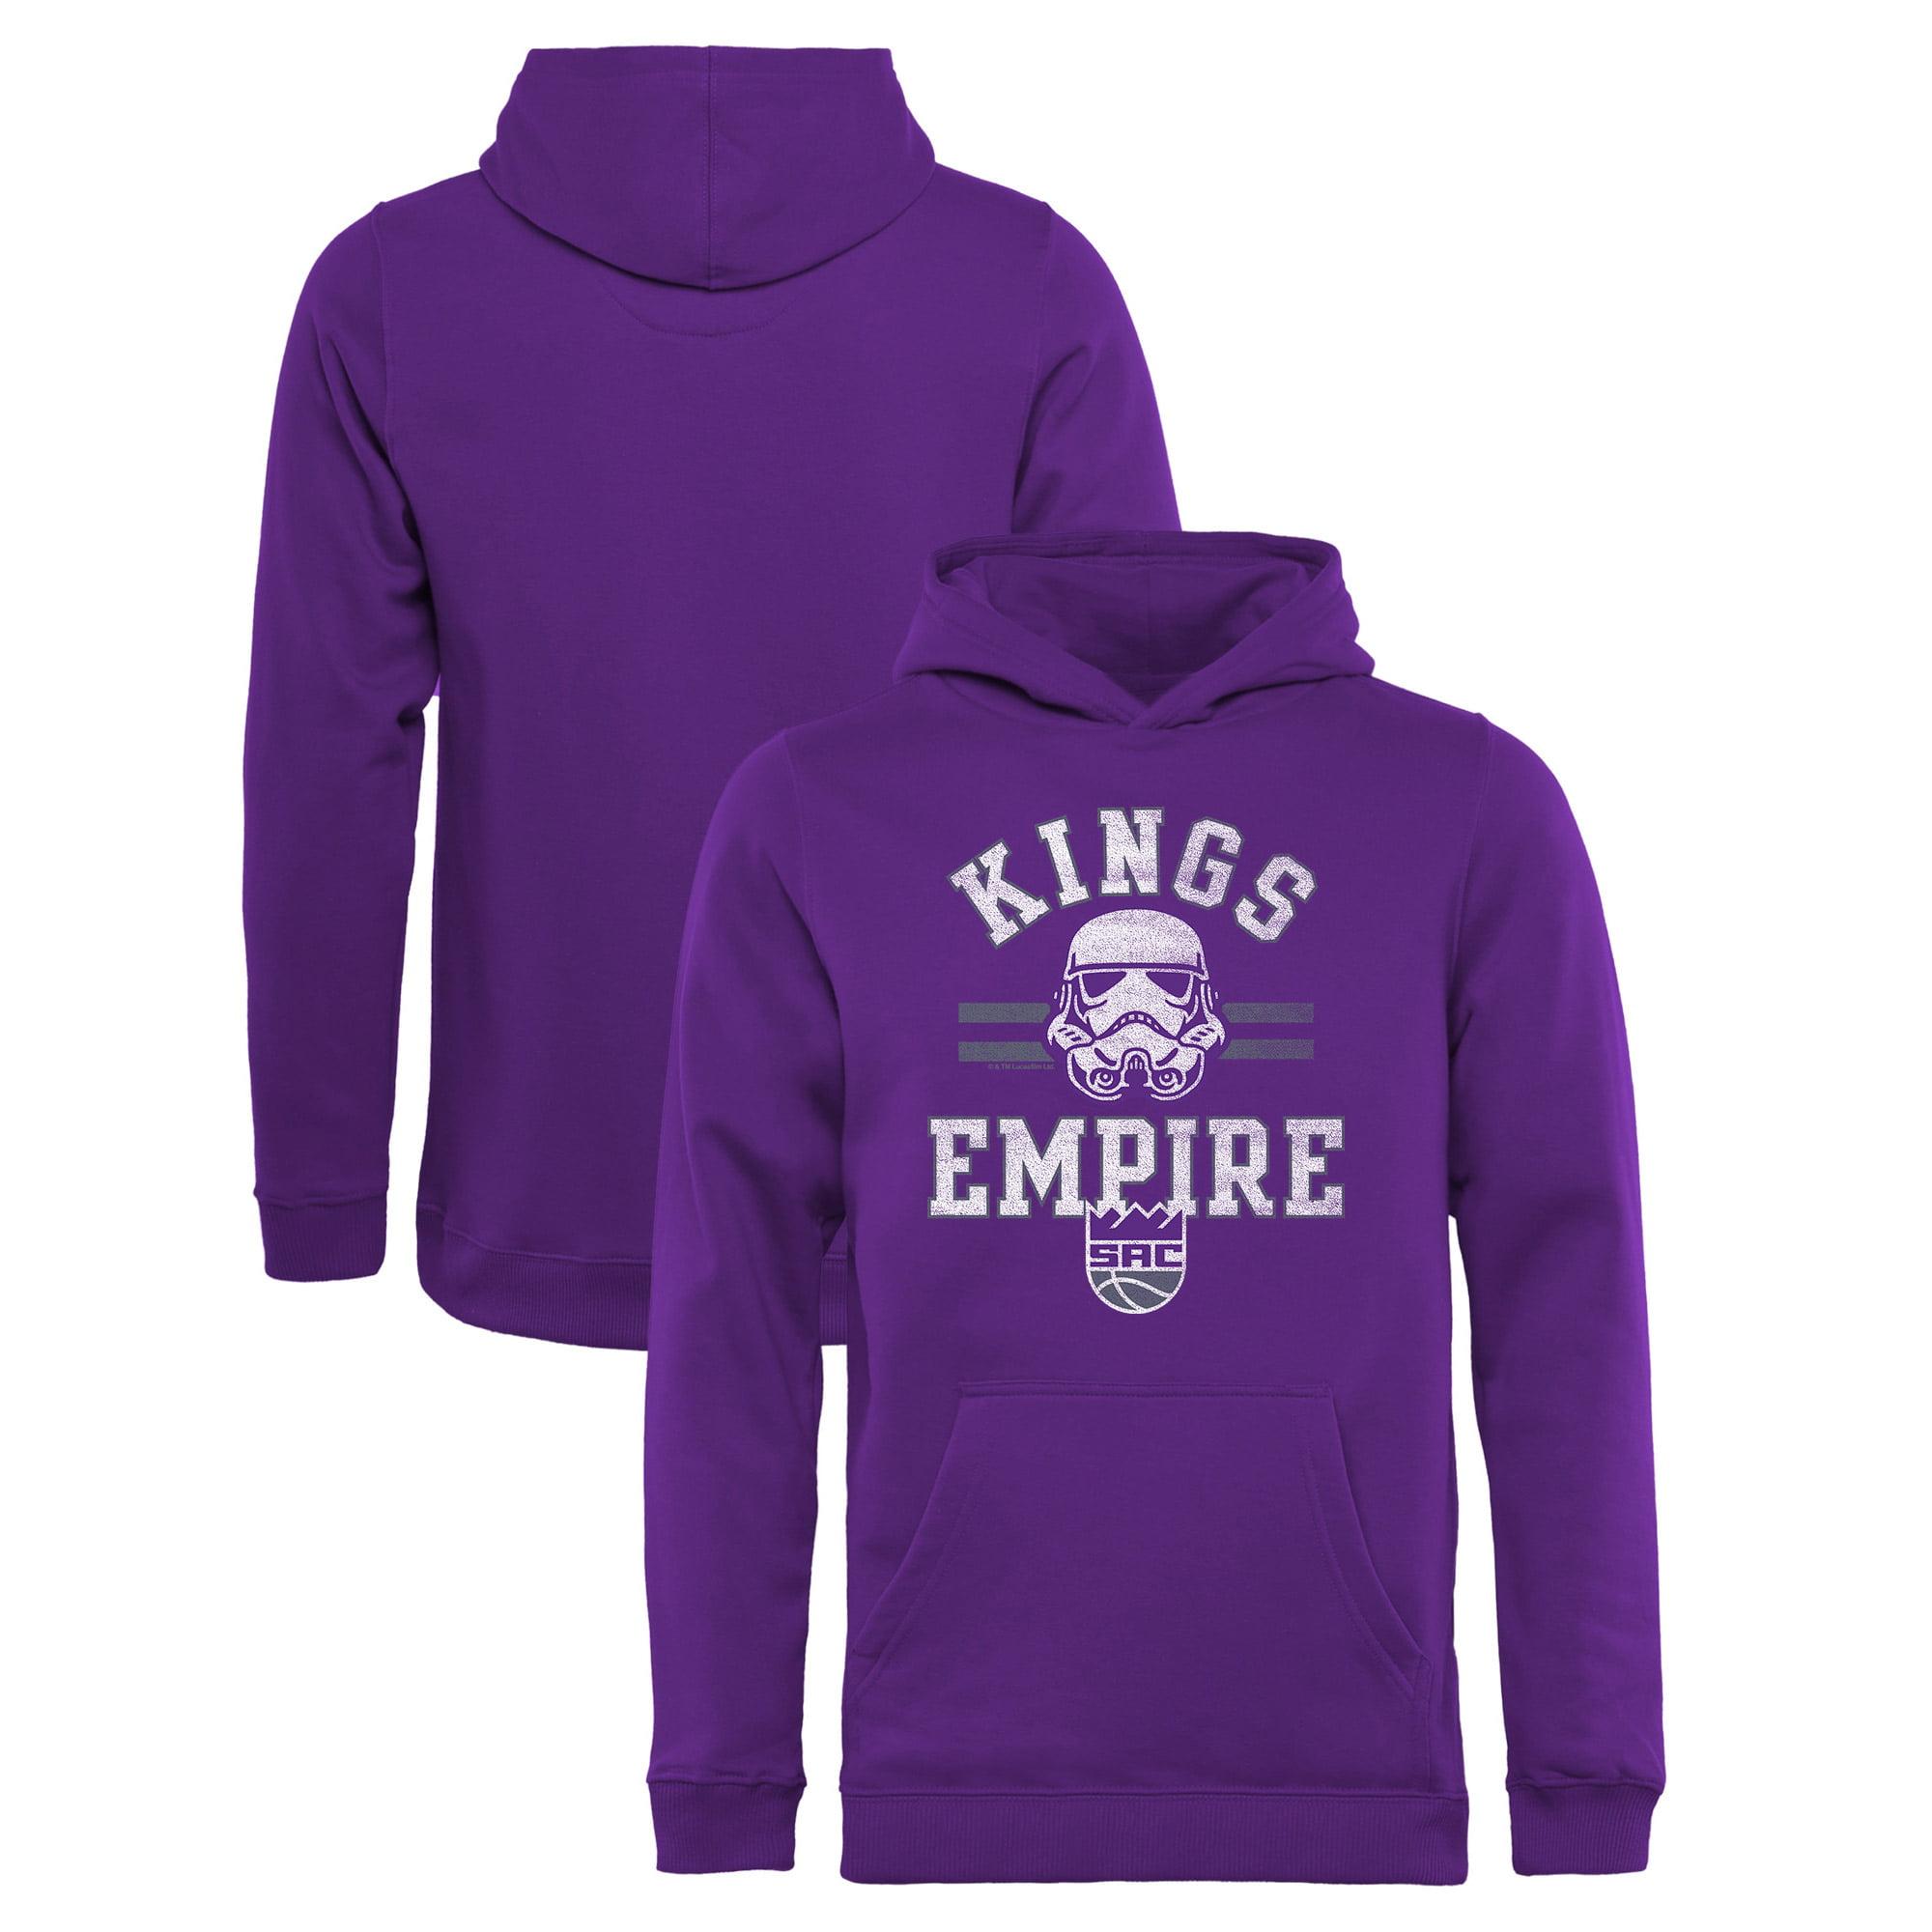 Sacramento Kings Fanatics Branded Youth Star Wars Empire Pullover Hoodie - Purple